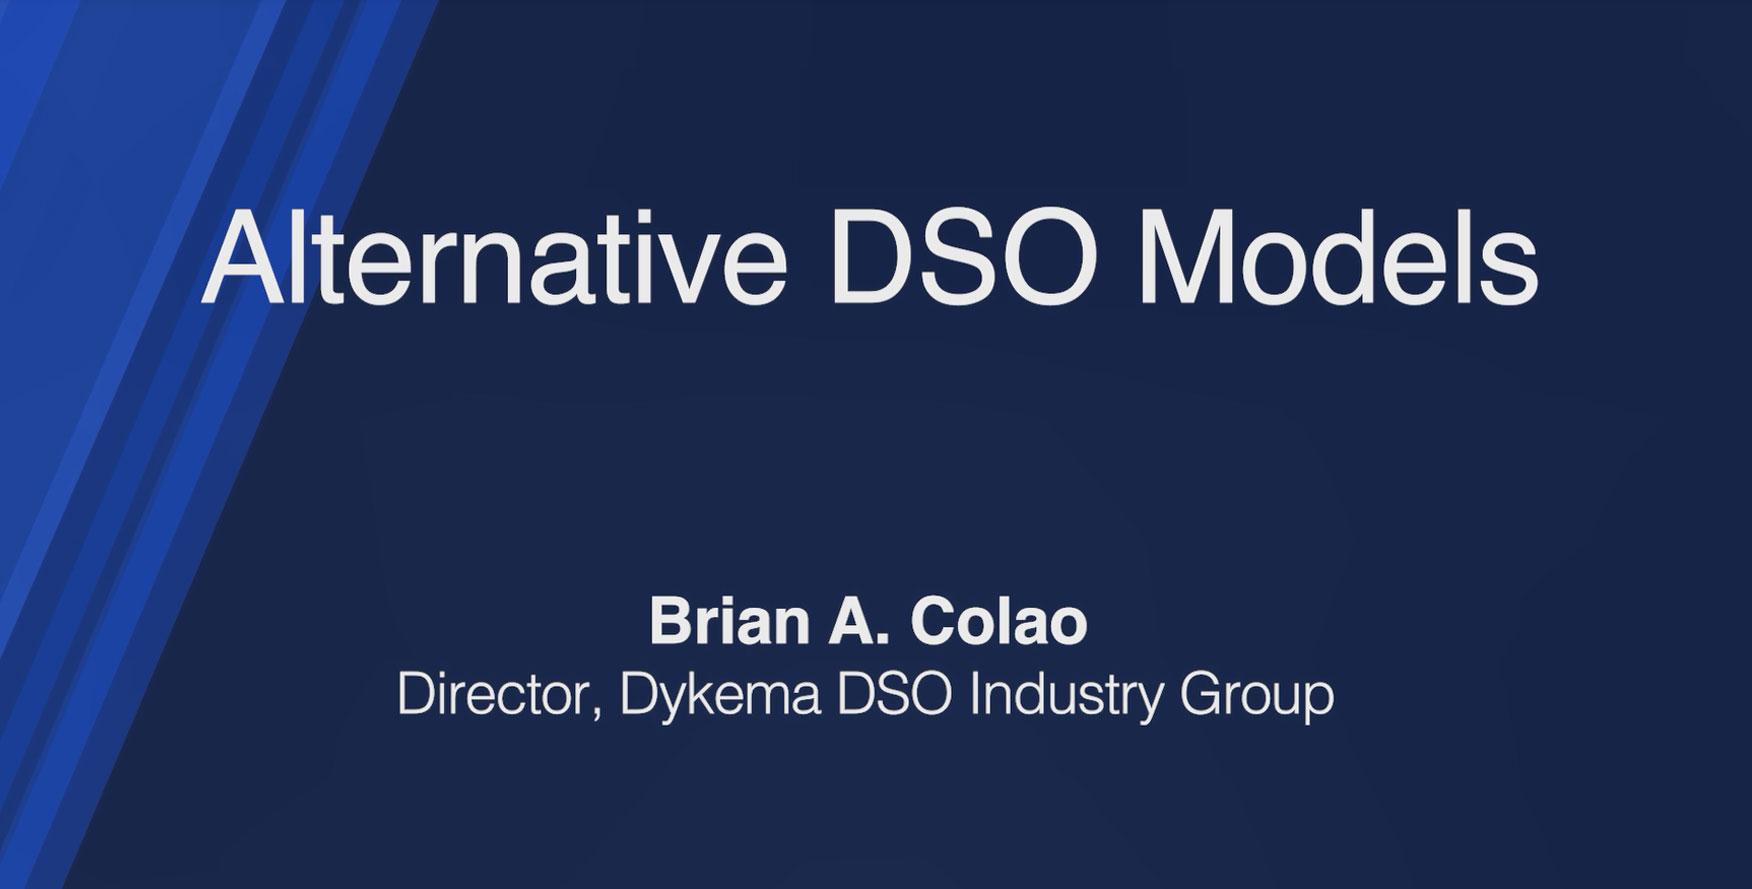 Alternative DSO Models